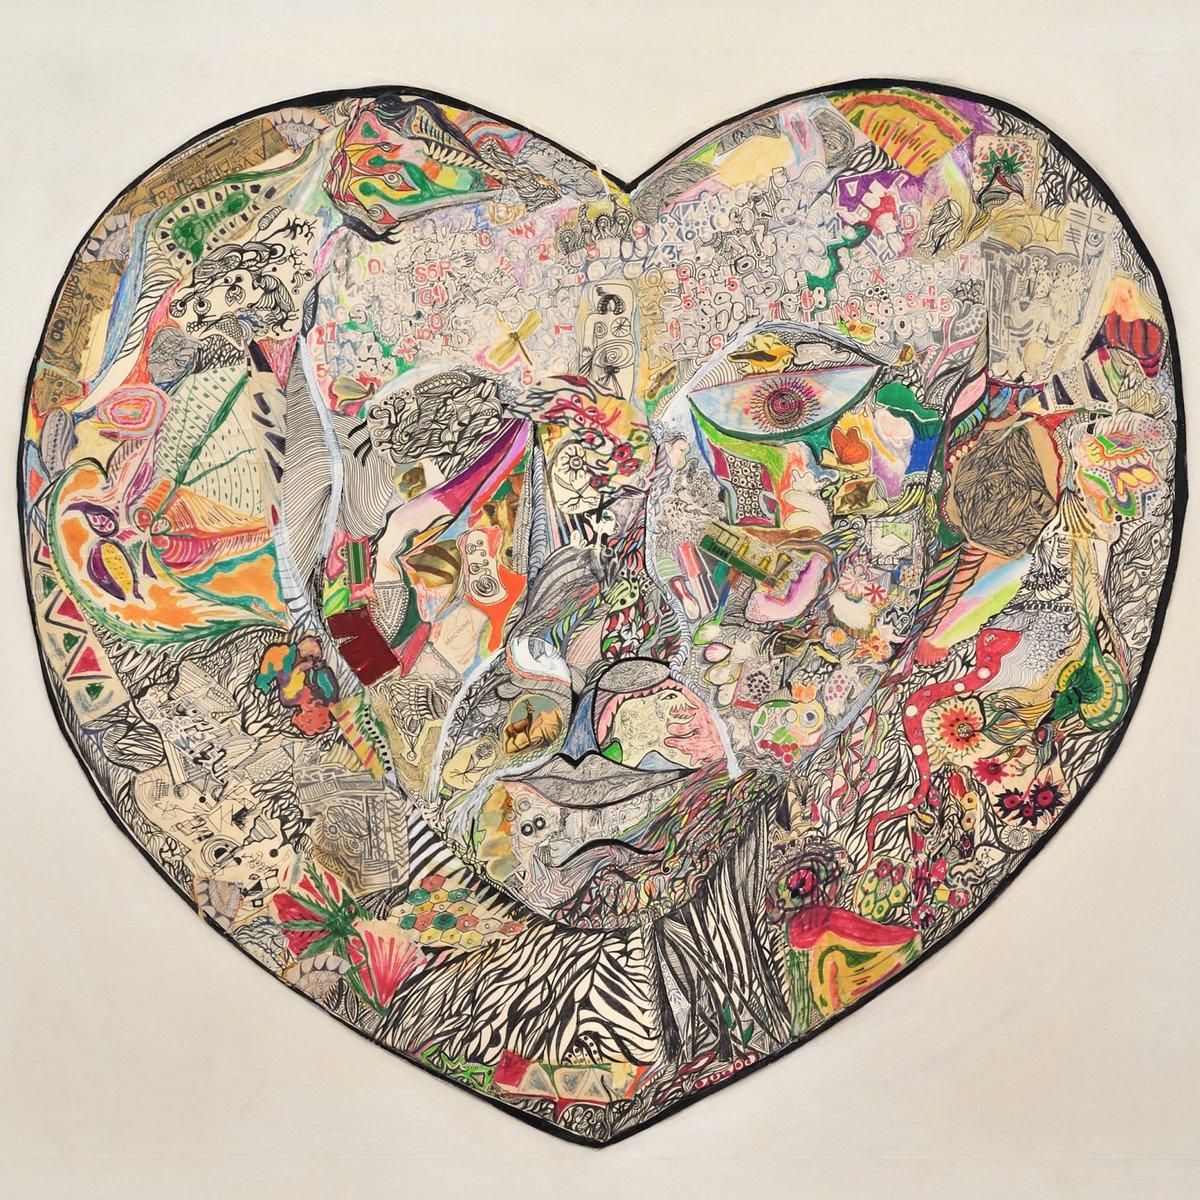 #artbrusselscountdown 38 days until #Vernissage feat #GalerieMitterrand #NikideSaintPhale #artbrussels #PRIME #artfair #Brussels<br>http://pic.twitter.com/zpa39fohok